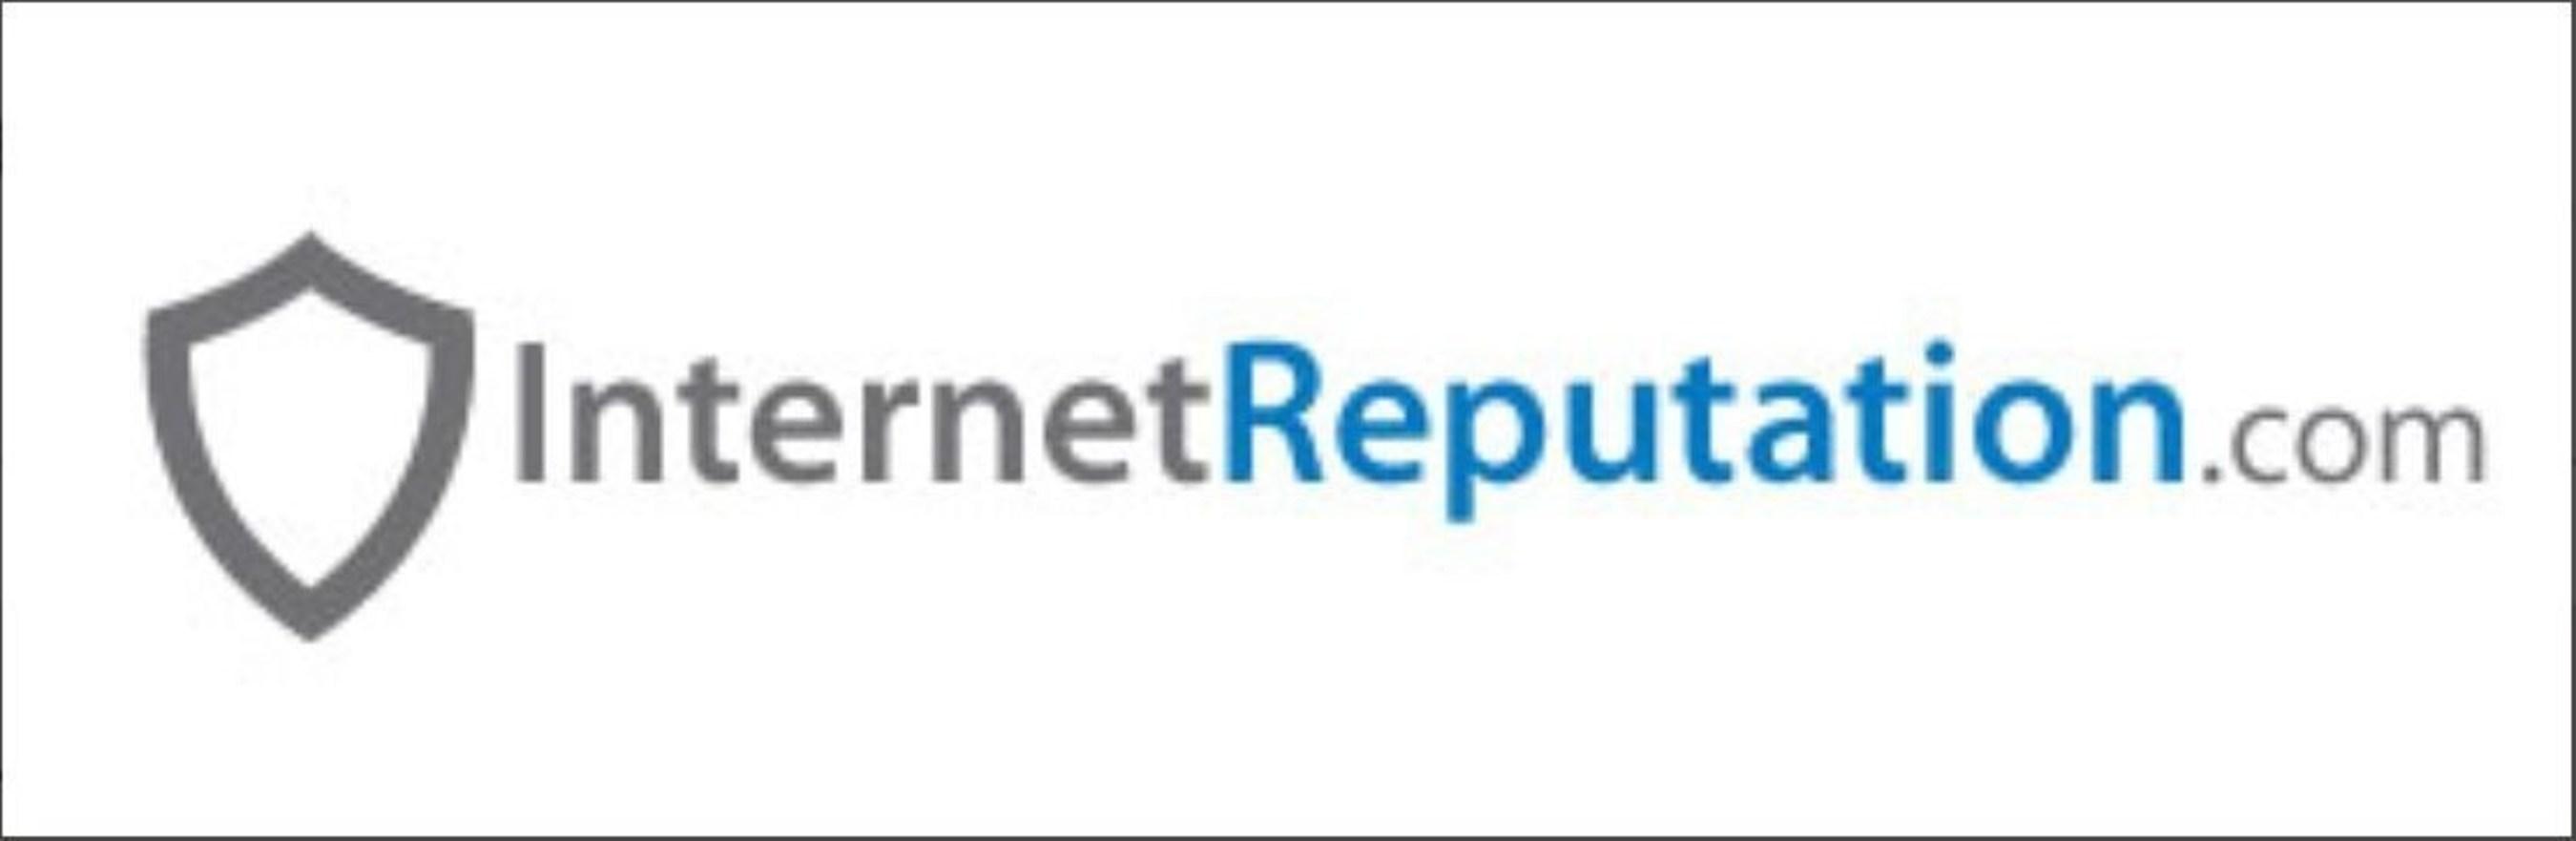 InternetReputation.com Named a Top Ten Best SEO Company